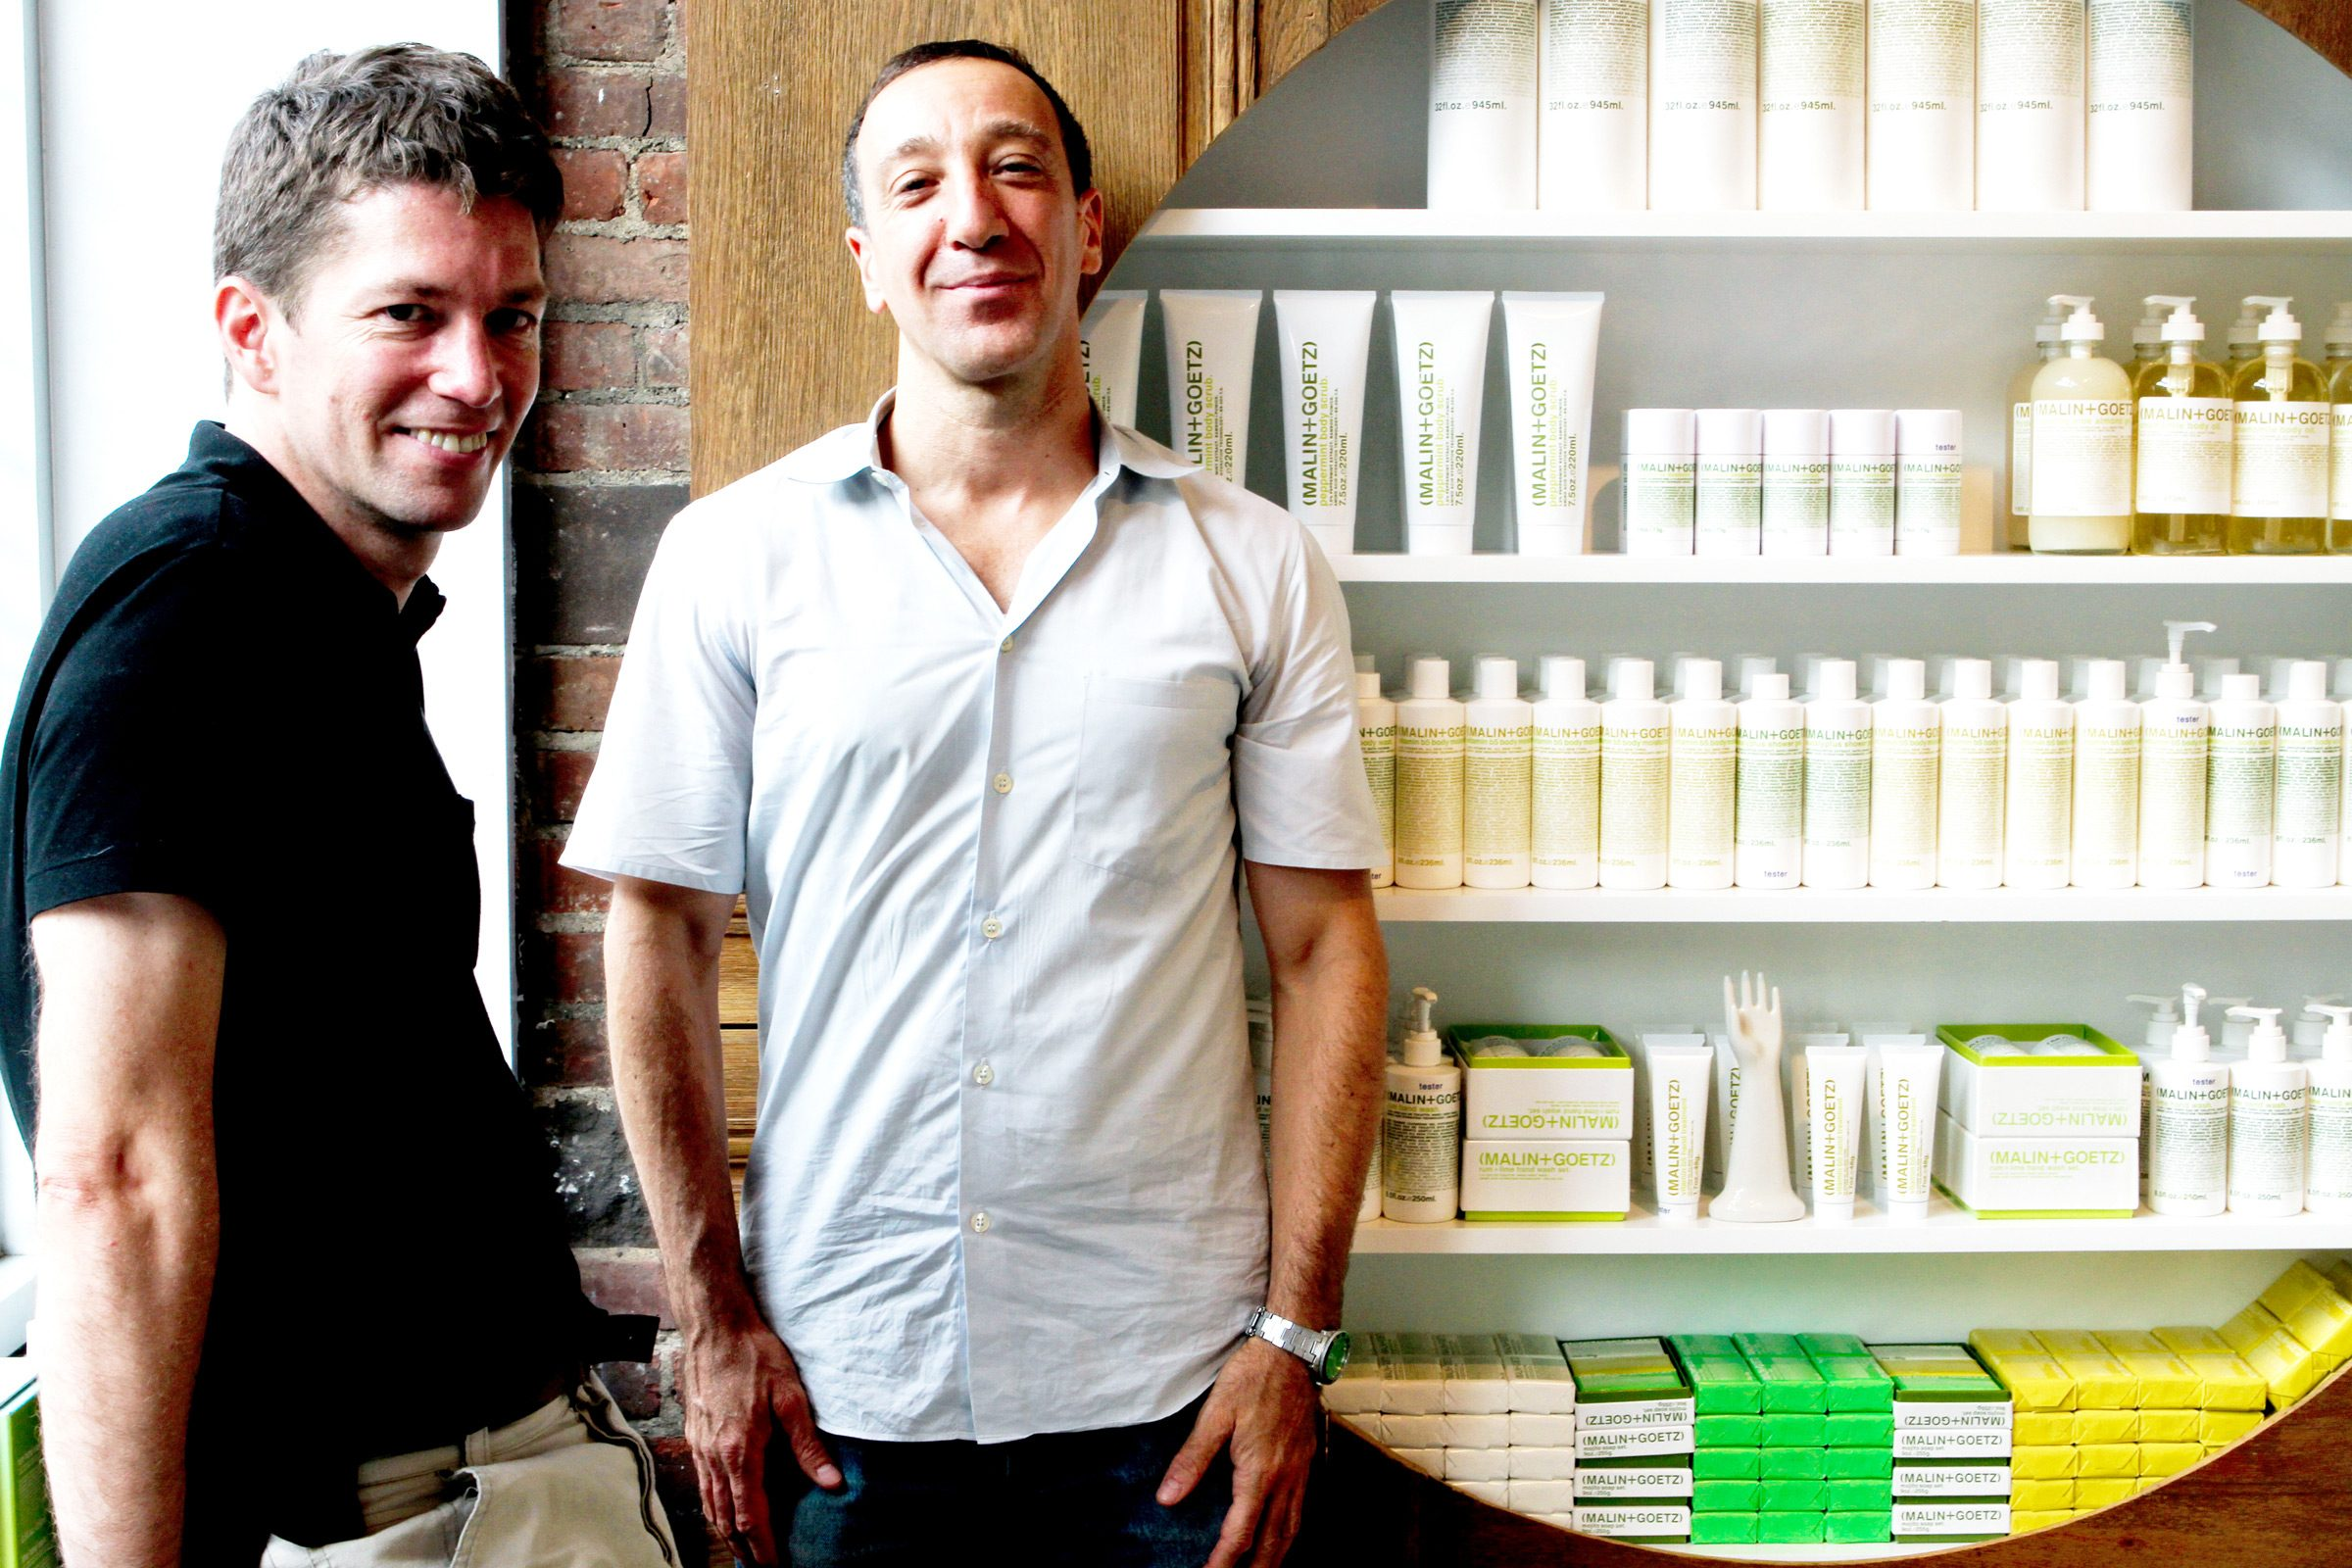 COSMANIA: Malin+Goetz: apothekersmerk 3.0